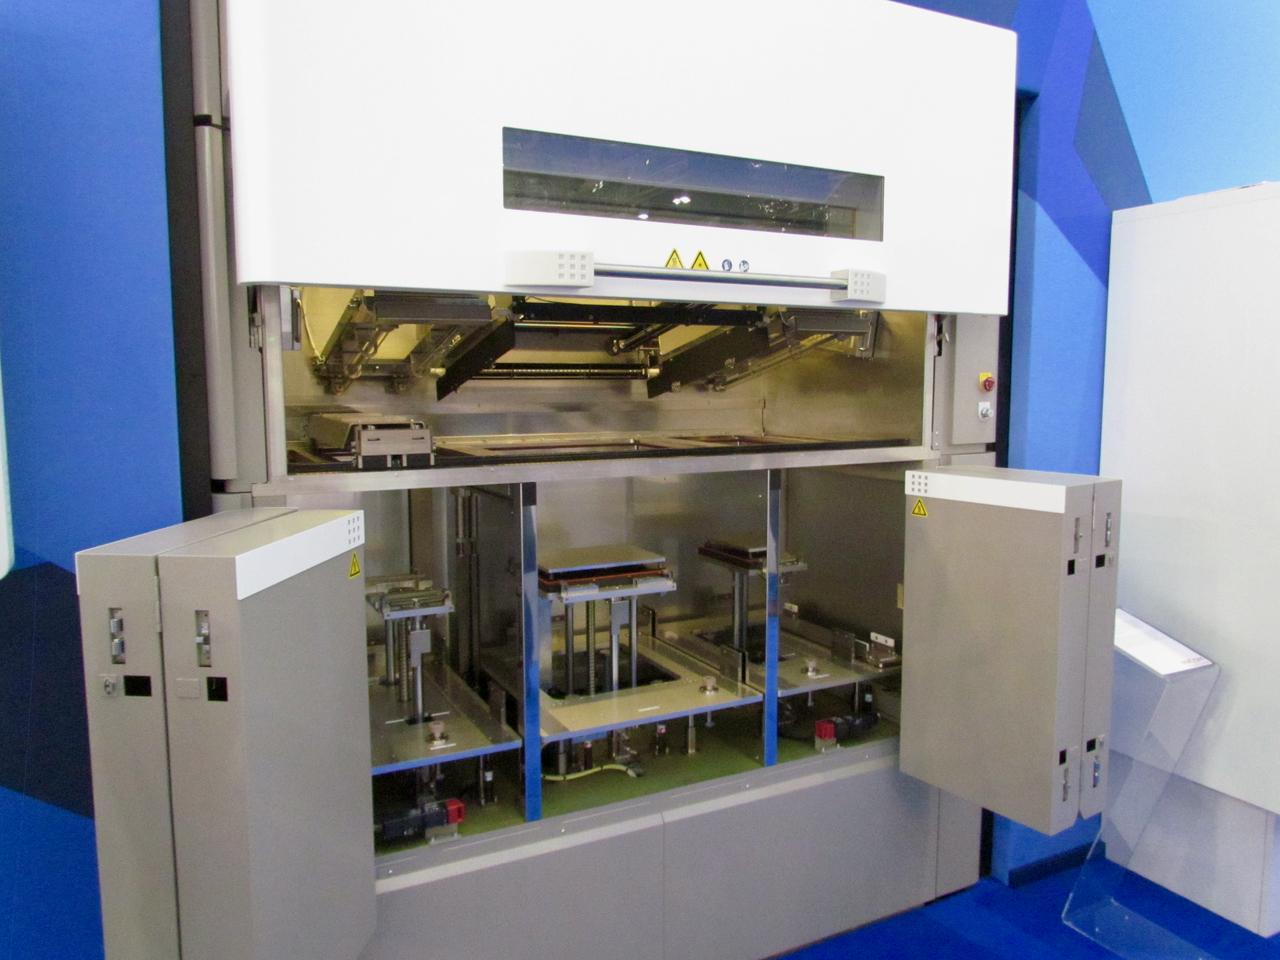 Ricoh's Powerful SLS 3D Printing System